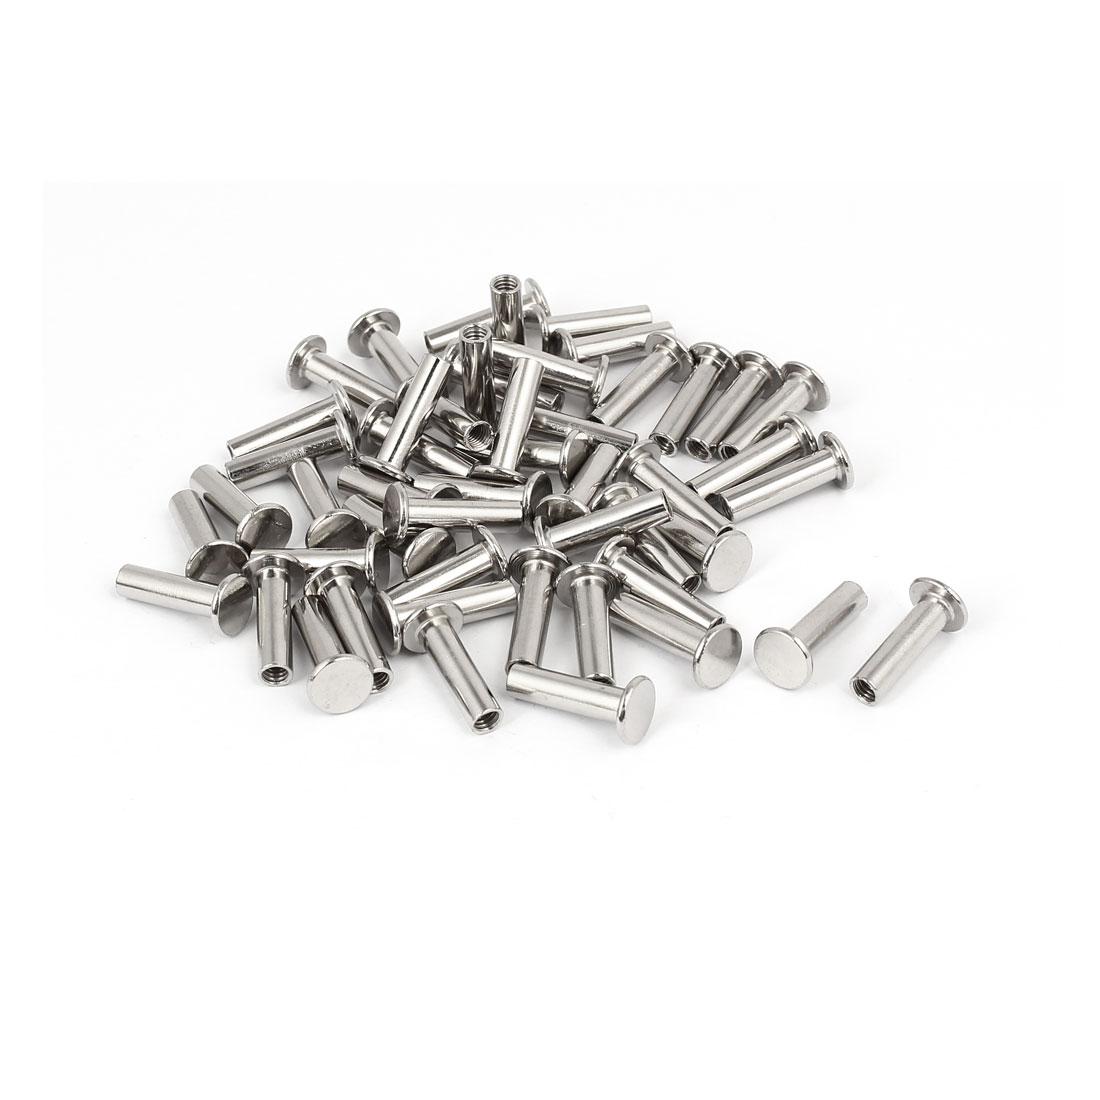 Photo Album Metal Nickel Plated Binding Screw Post Barrel Nut 5mmx17mm 50pcs